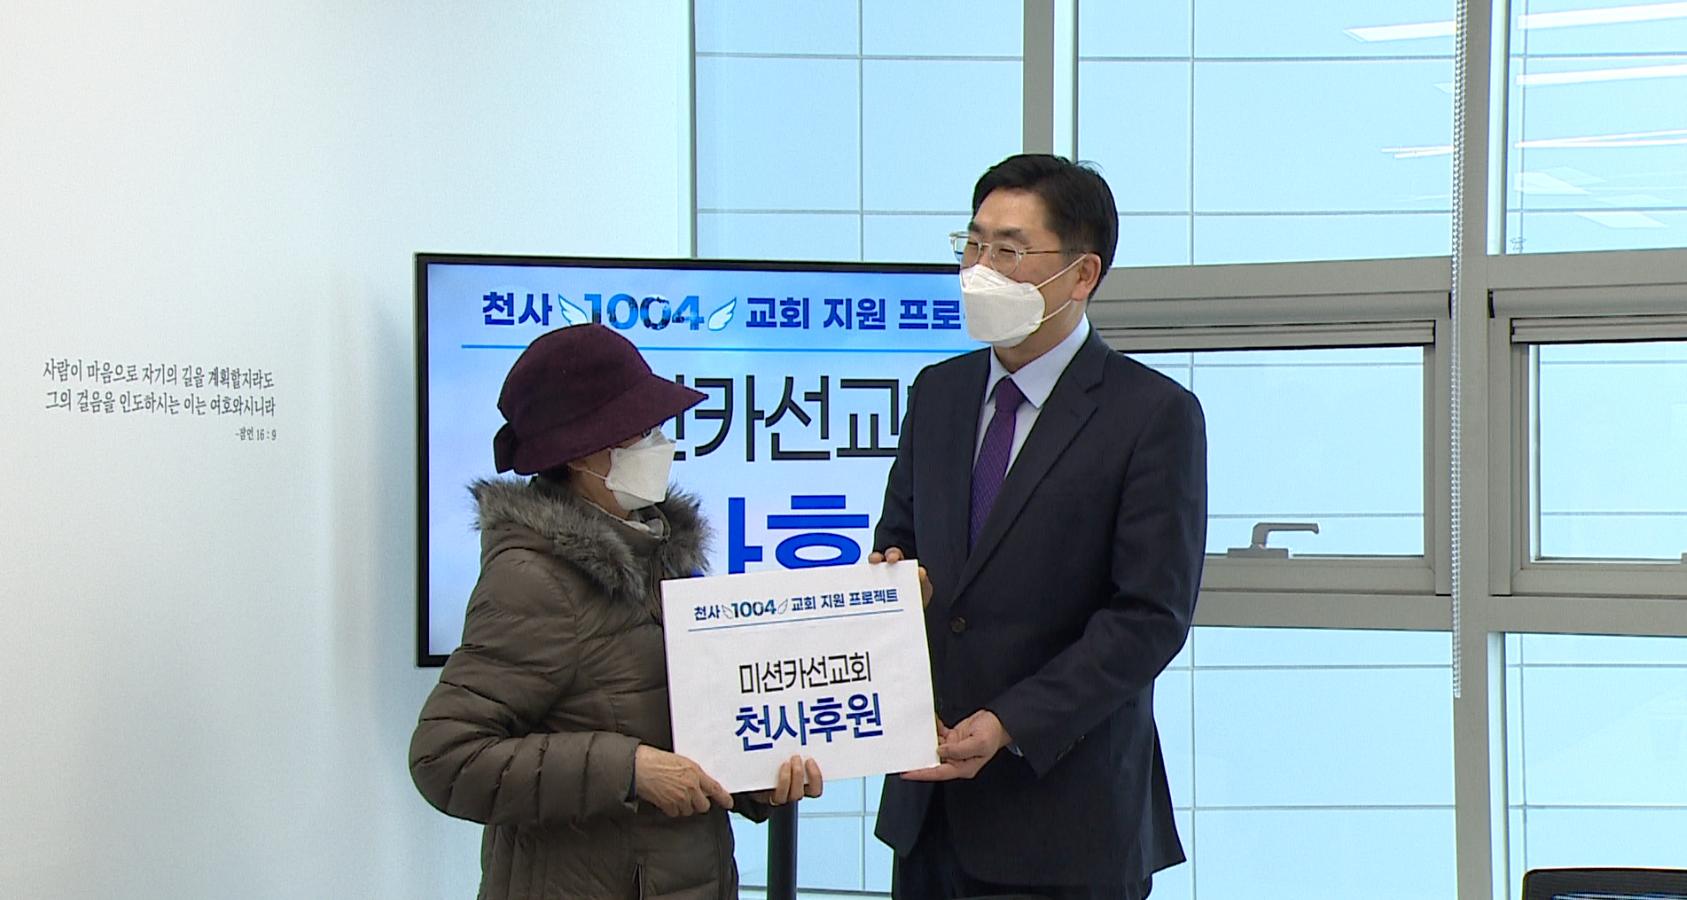 "GOODTV 천사(1004)교회 돕는 손길…""뉴스 보고 후원결심""관련 이미지 입니다."